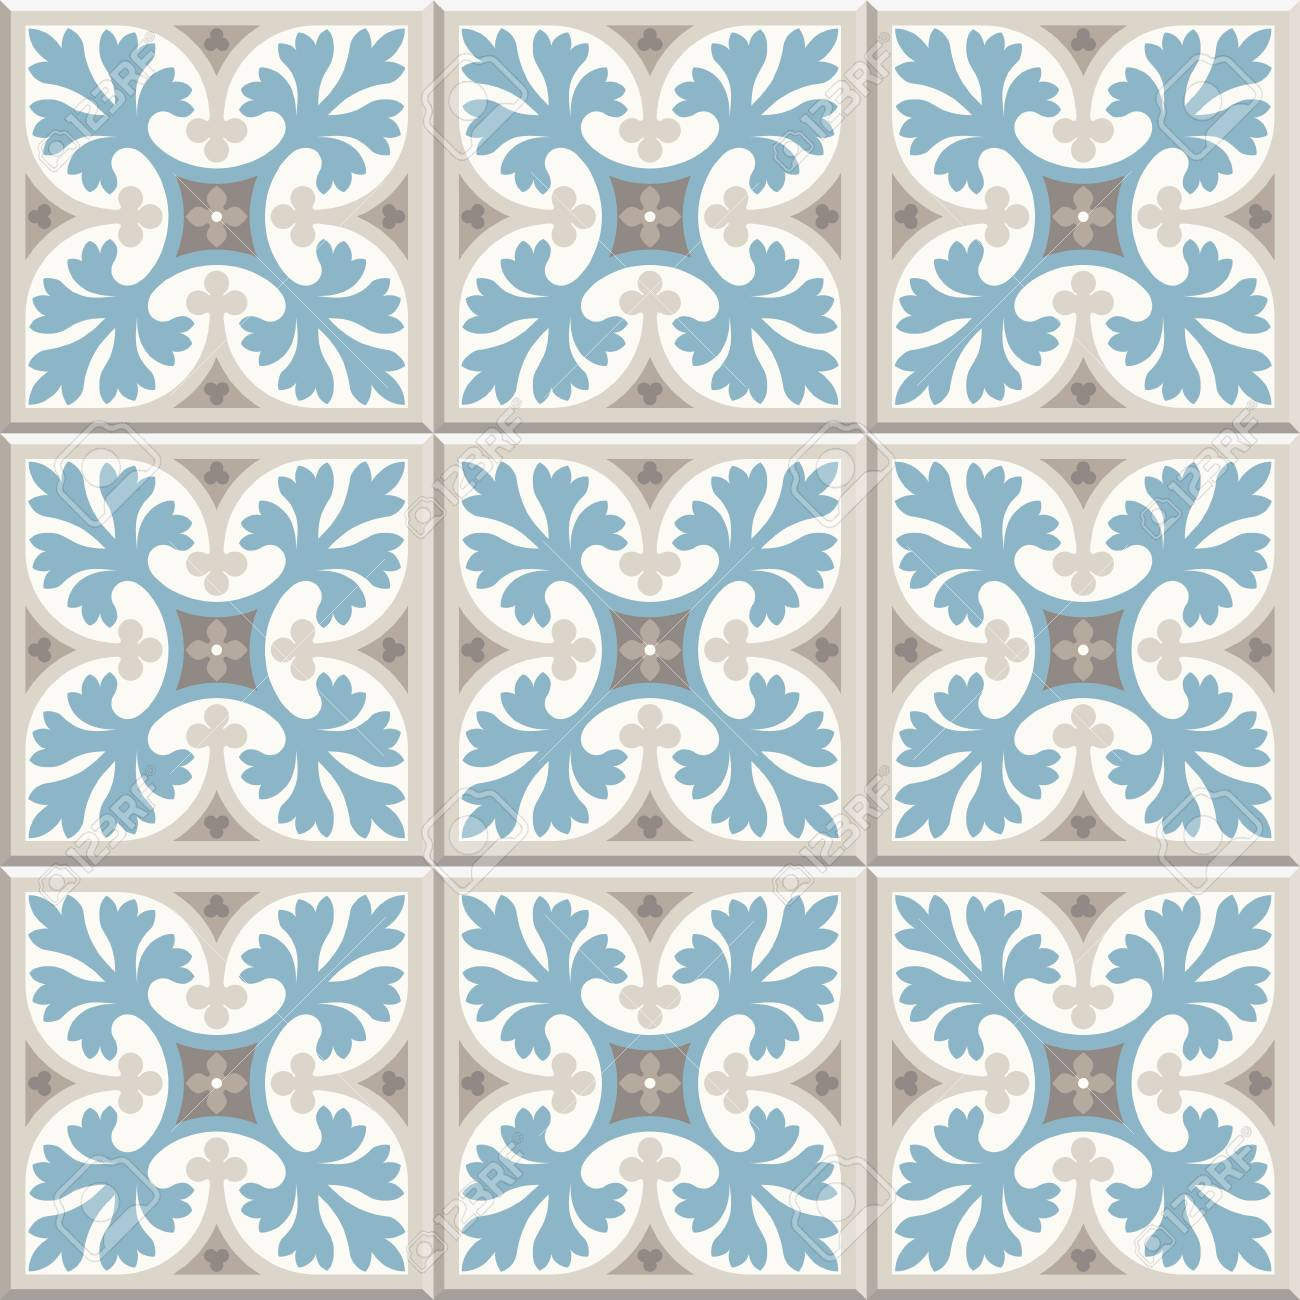 Ancient Floor Ceramic Tiles. Flooring Tiling Seamless Vector ...